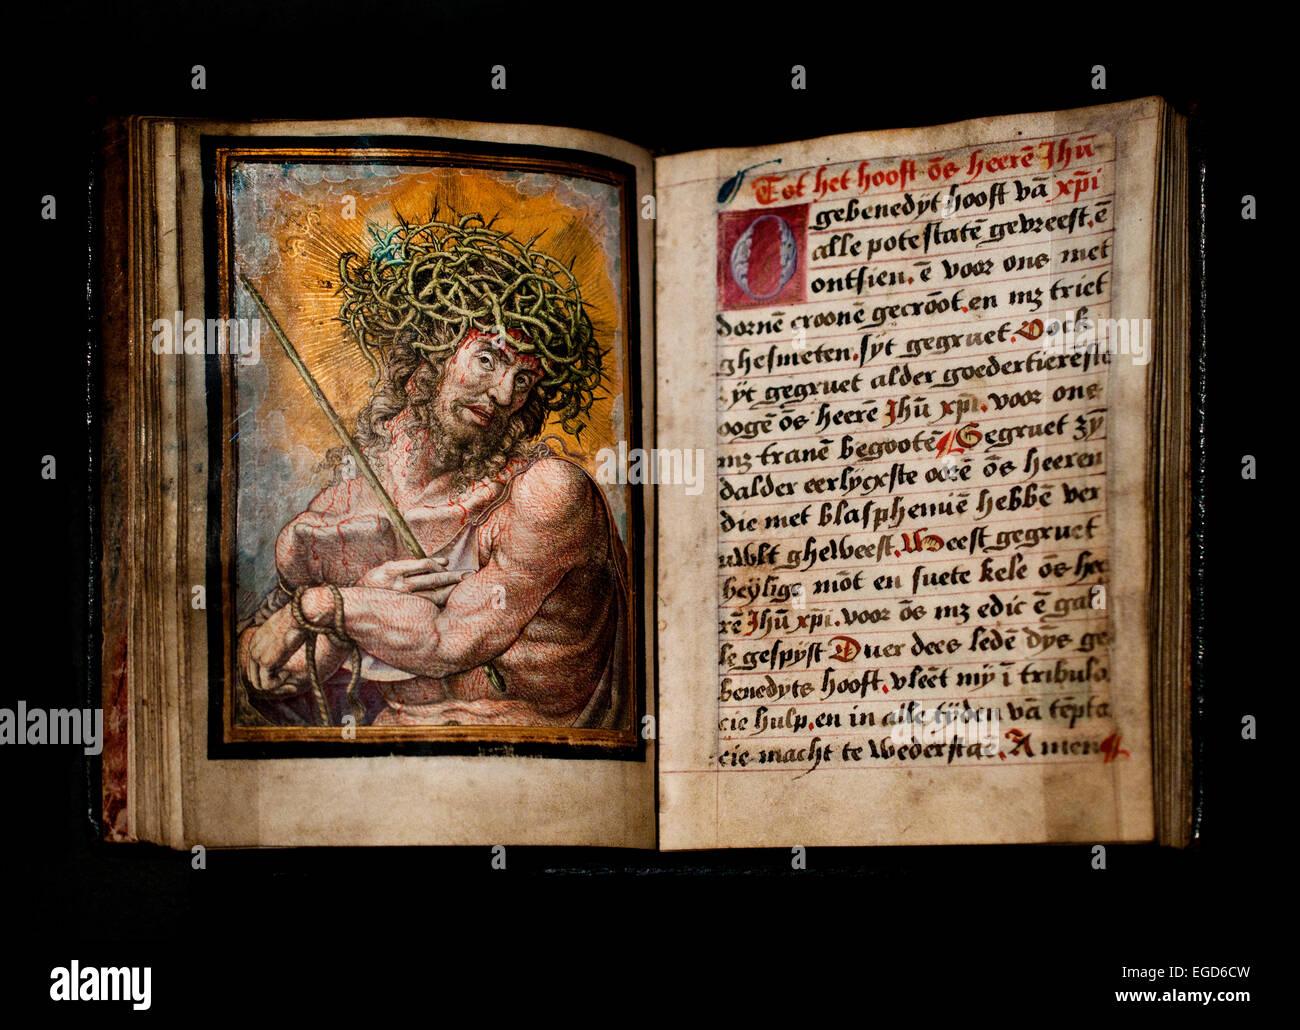 Christ as the Man of Sorrows 1525 Frans Crabbe van Espleghem Dutch Netherlands Stock Photo